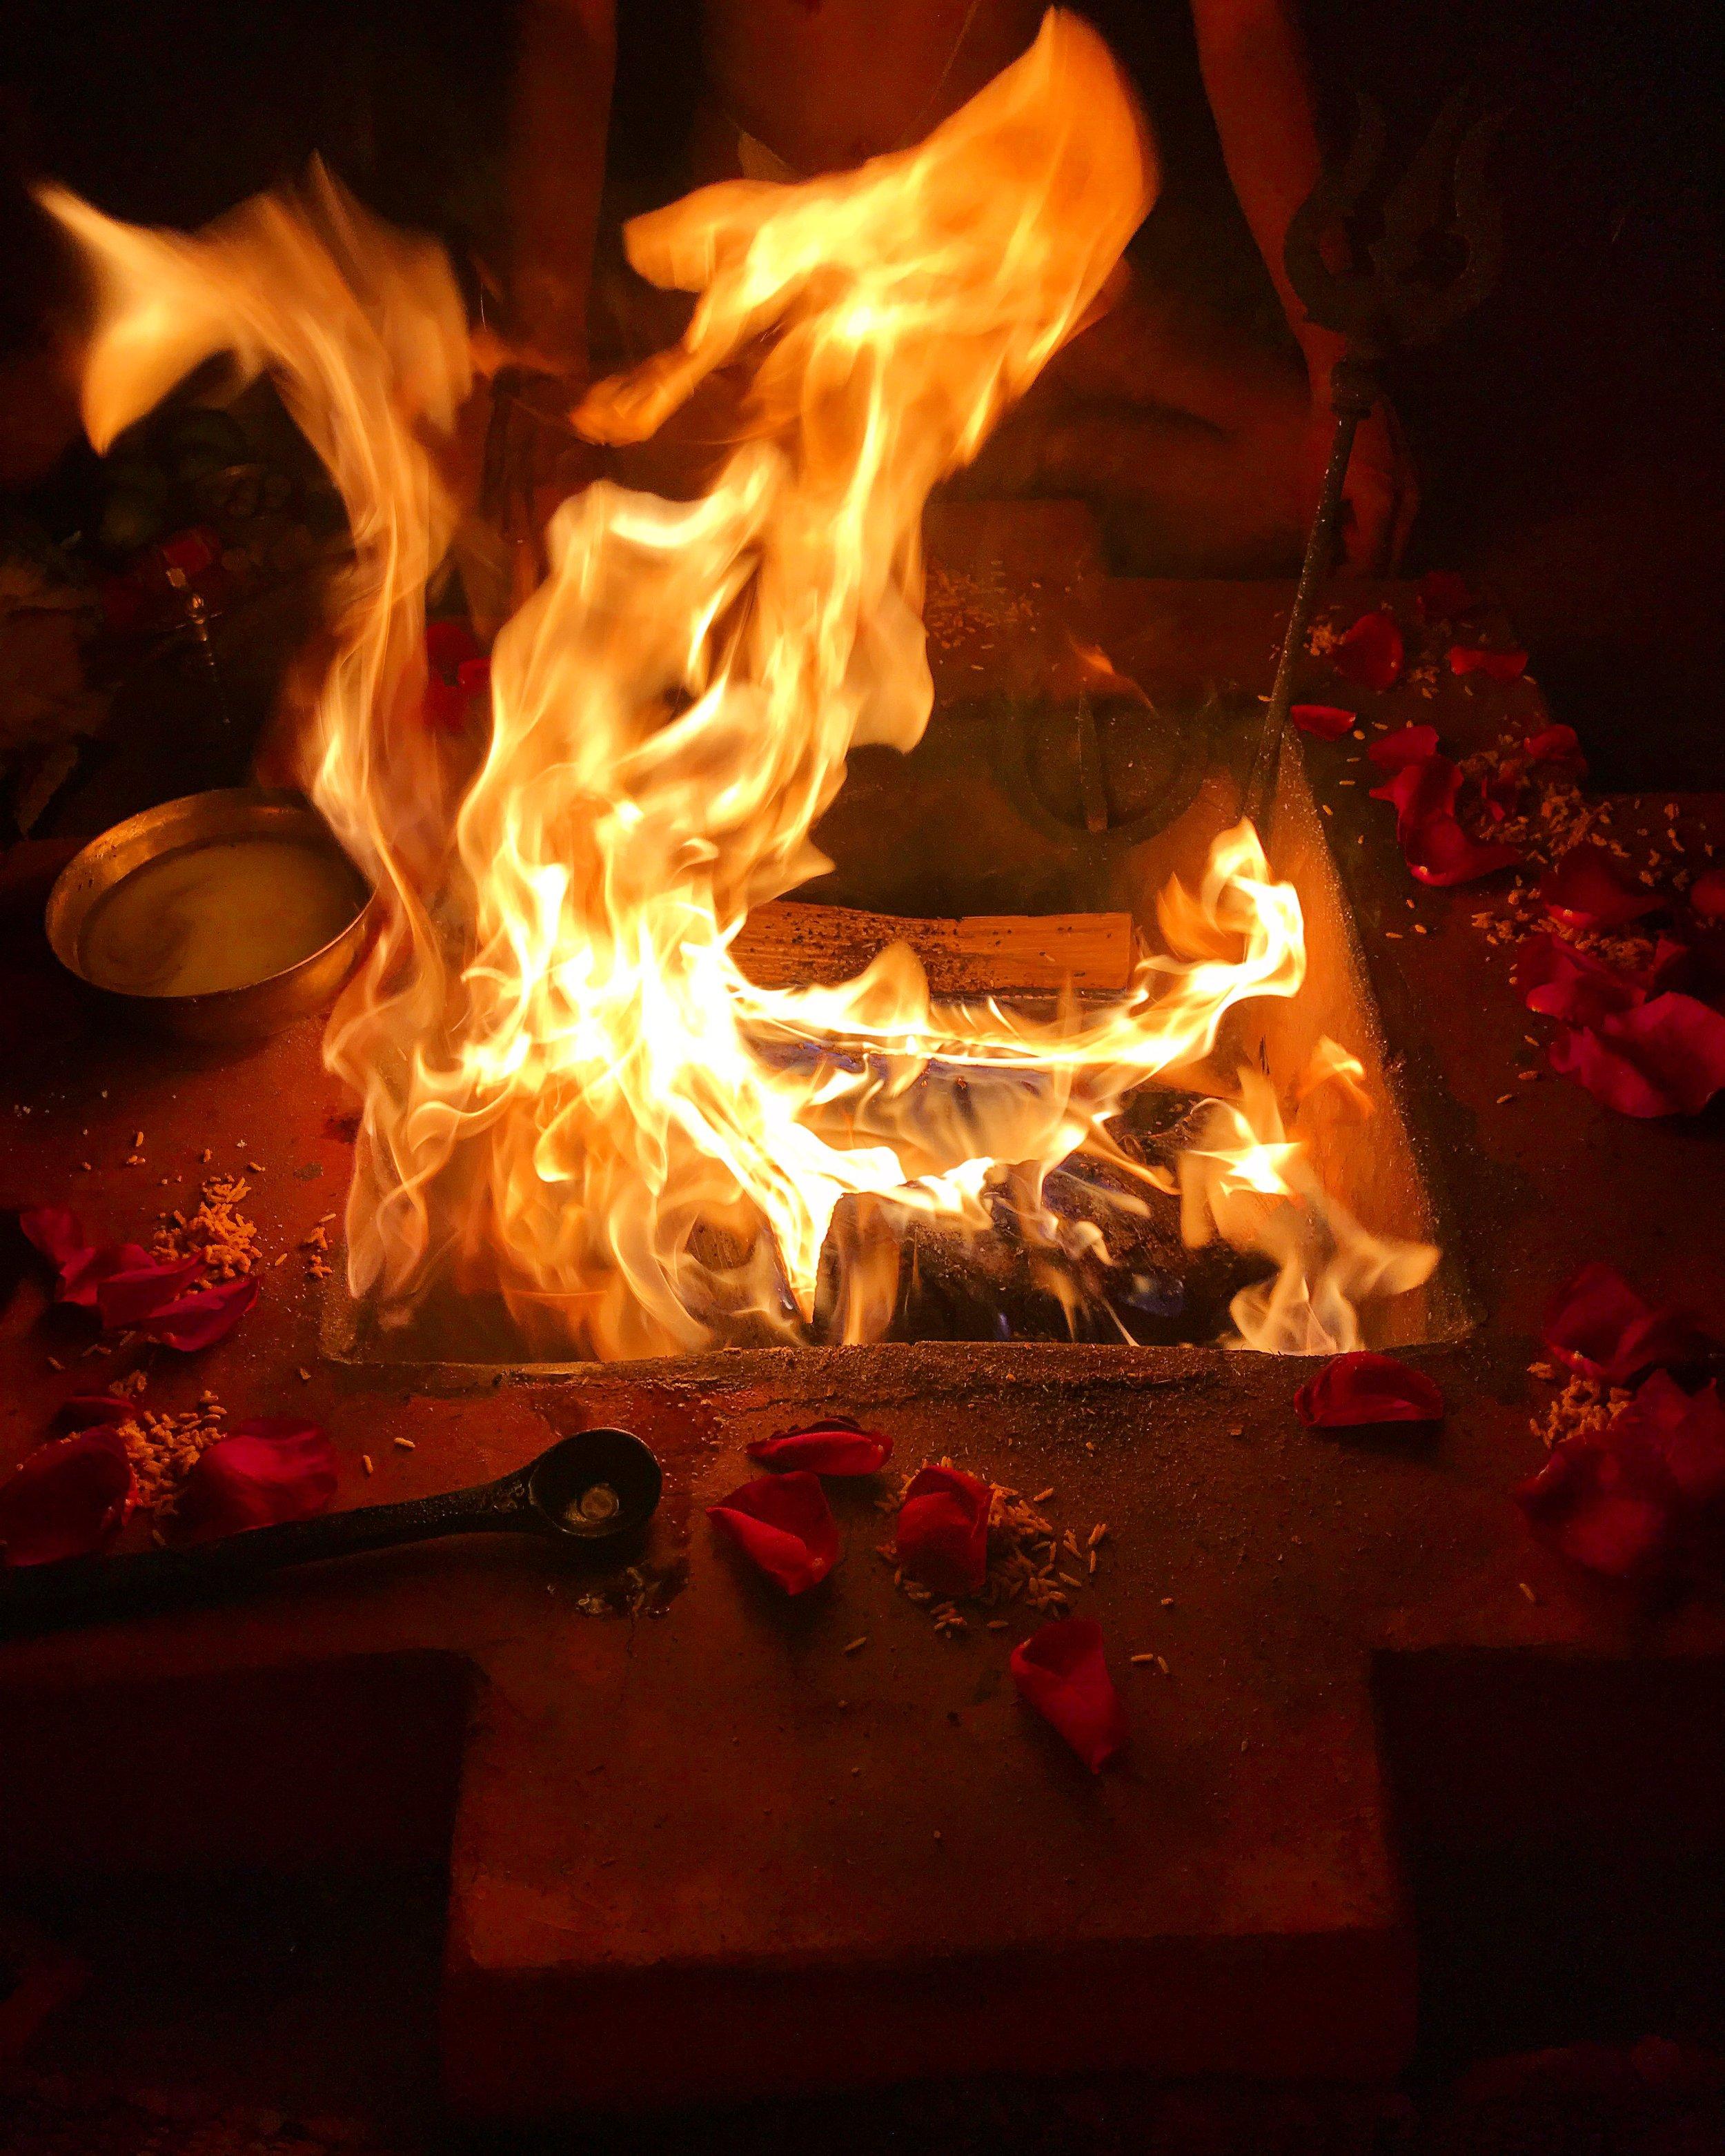 The sacred fire honoring Goddess Kamala blazes in the dhuni on the final night of Gupta Navaratri at Kali Mandir Ramakrishna Ashram.